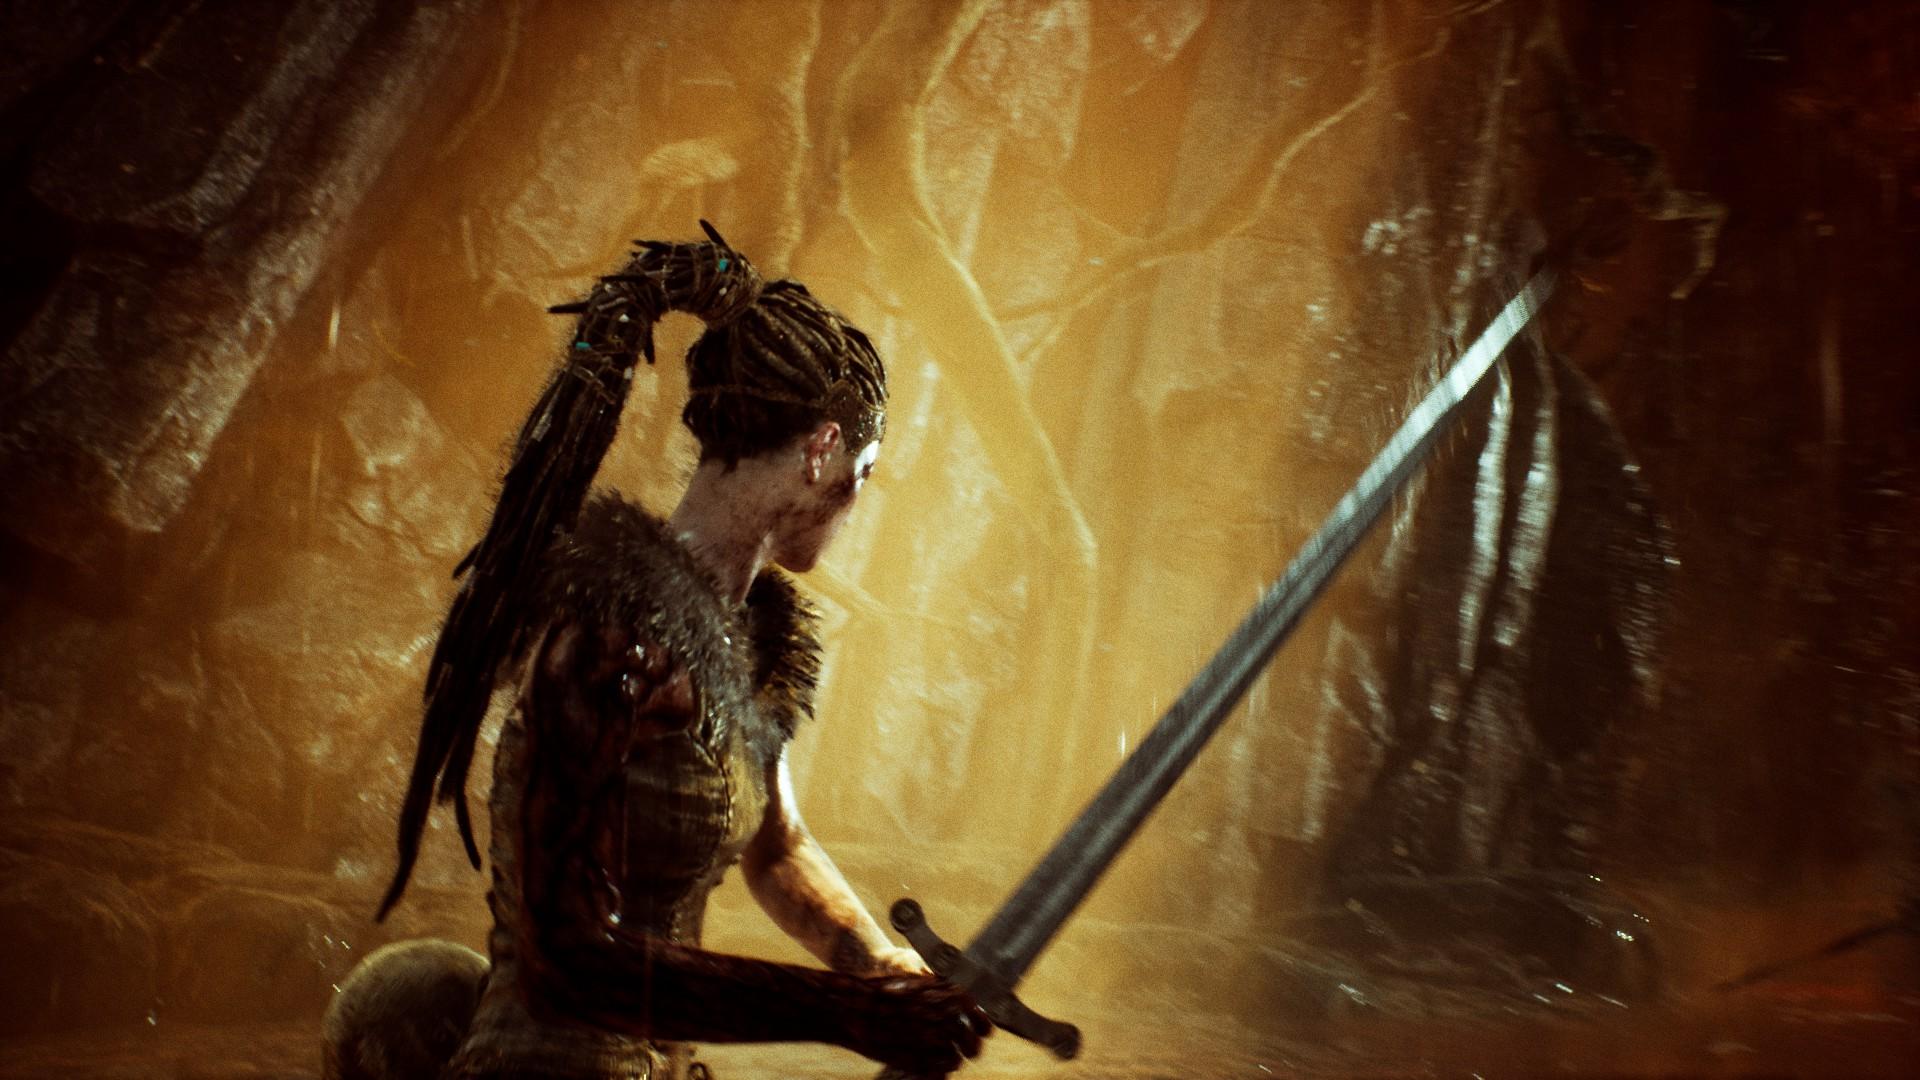 Les combats dans Hellblade : Senua's Sacrifice